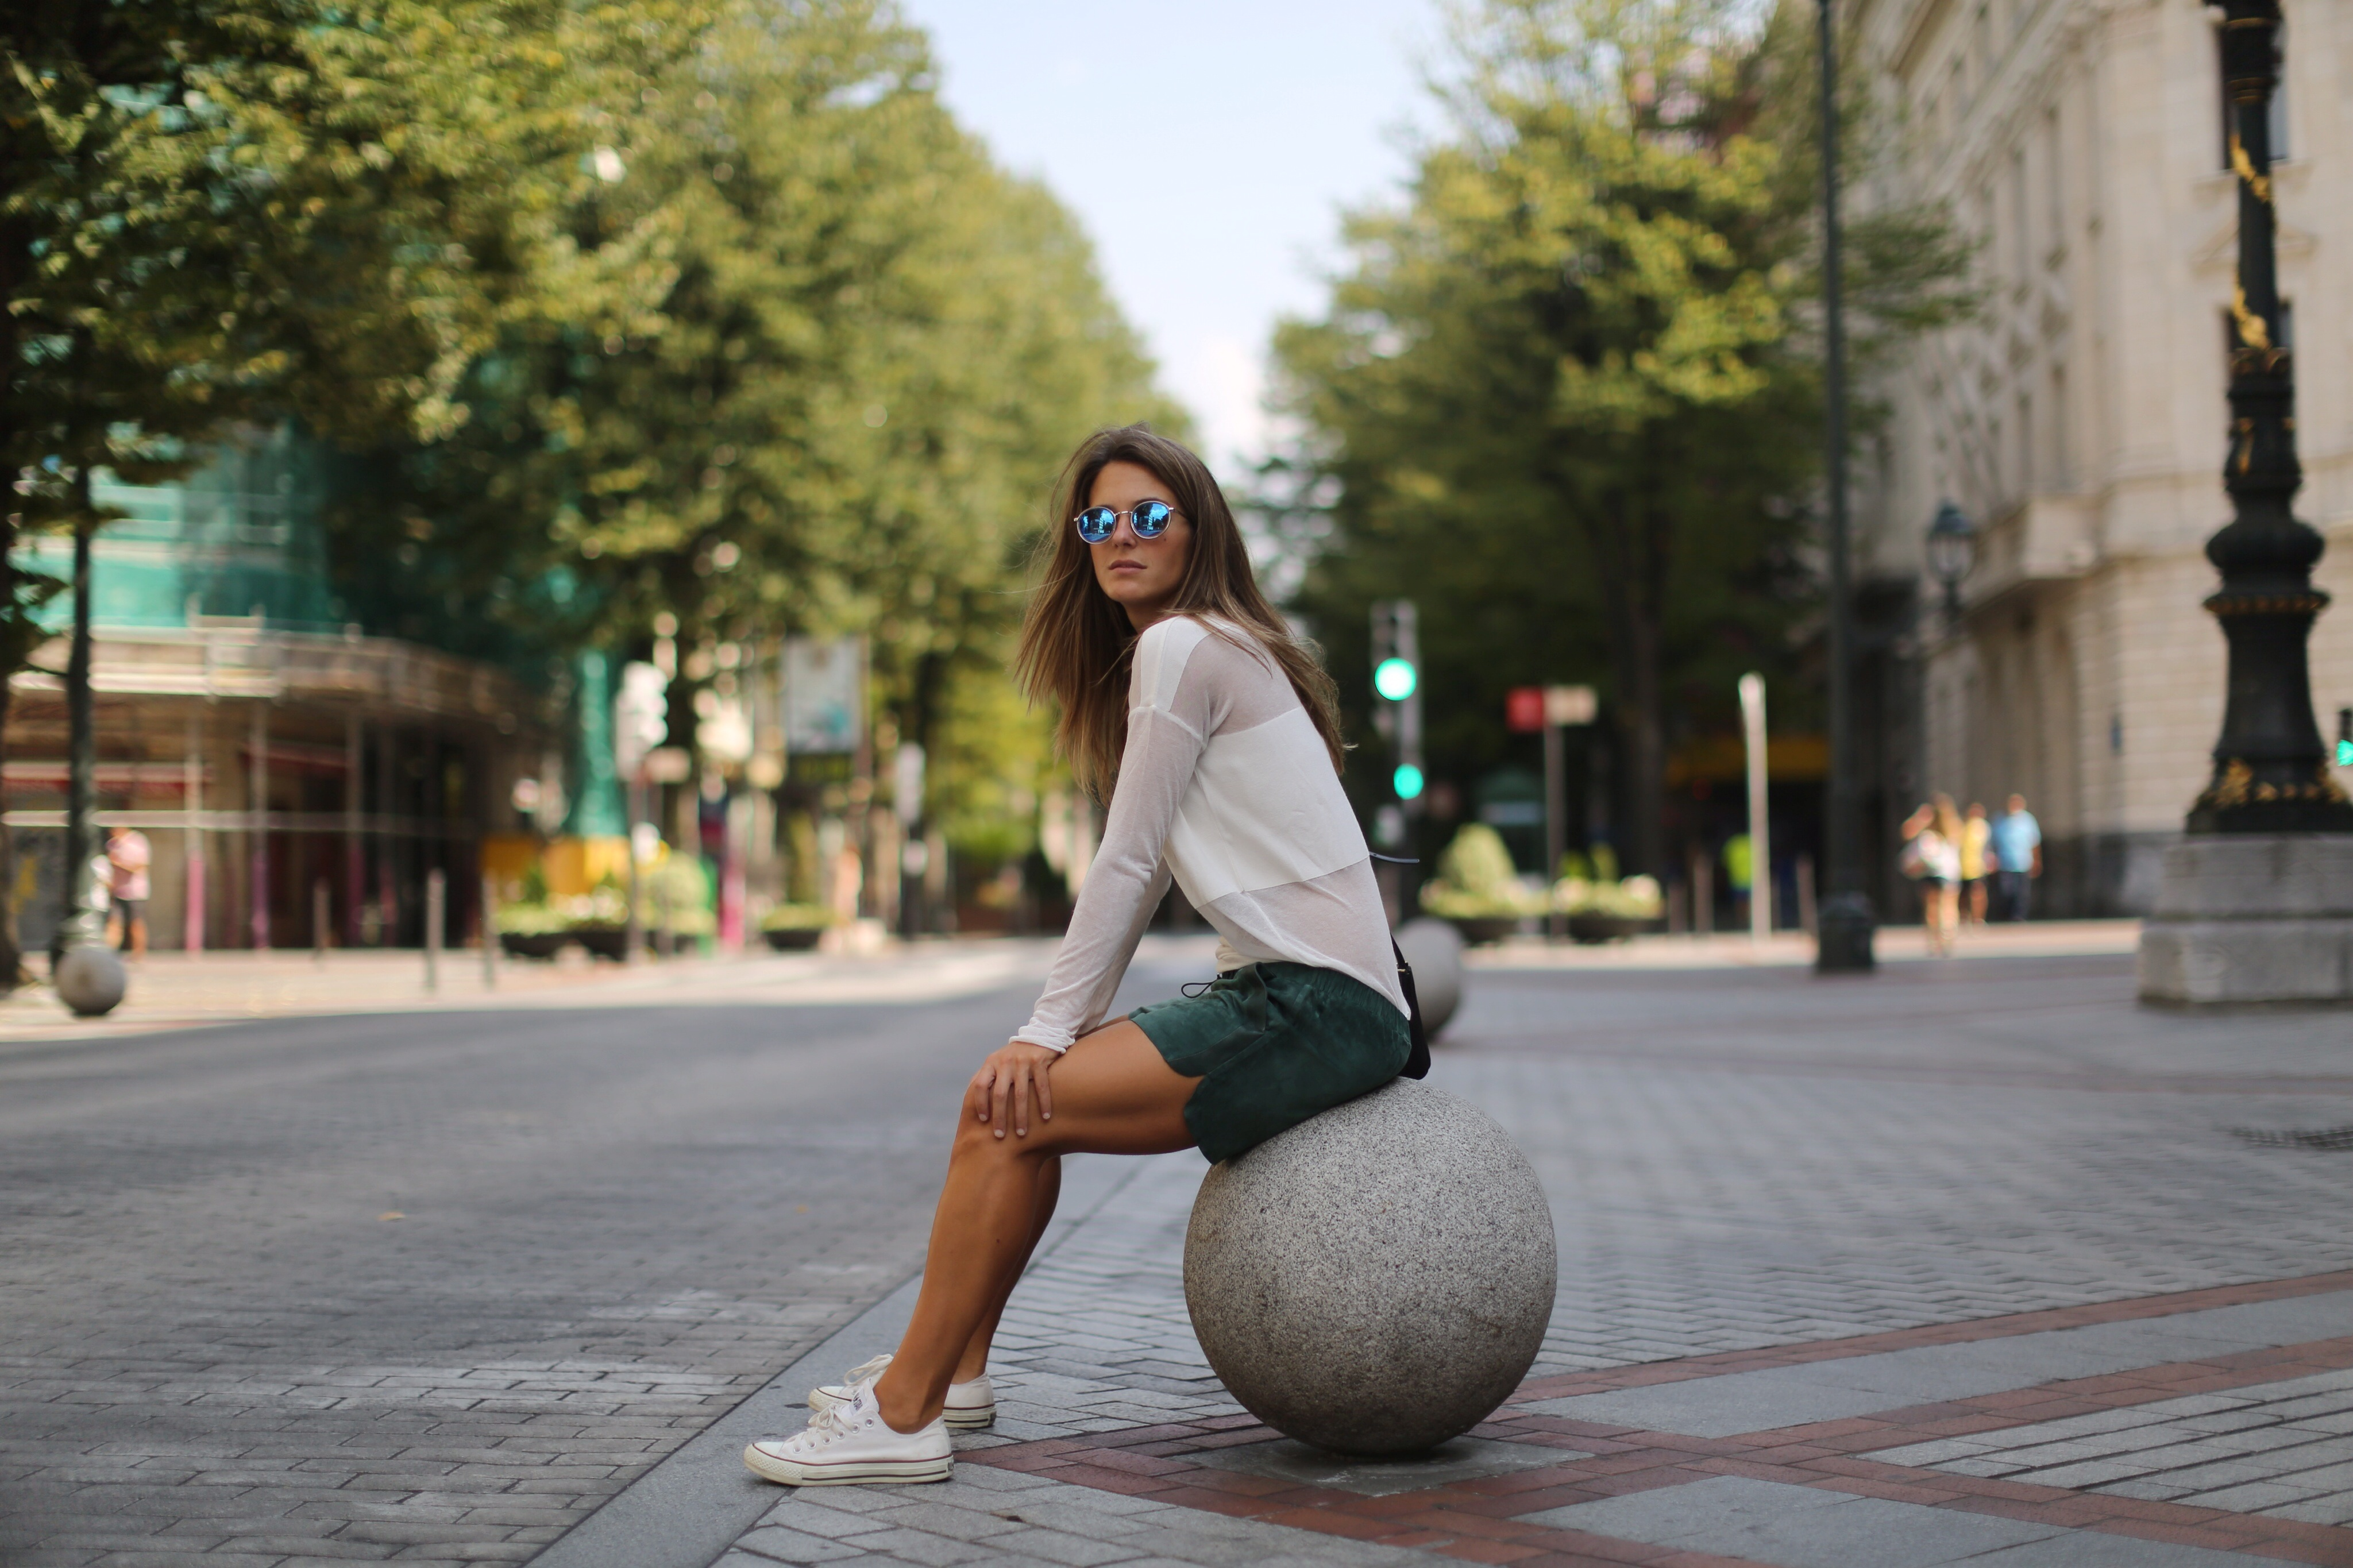 Clochet_h&m_trend_suede_shorts_converse_celine_trio_bag_02